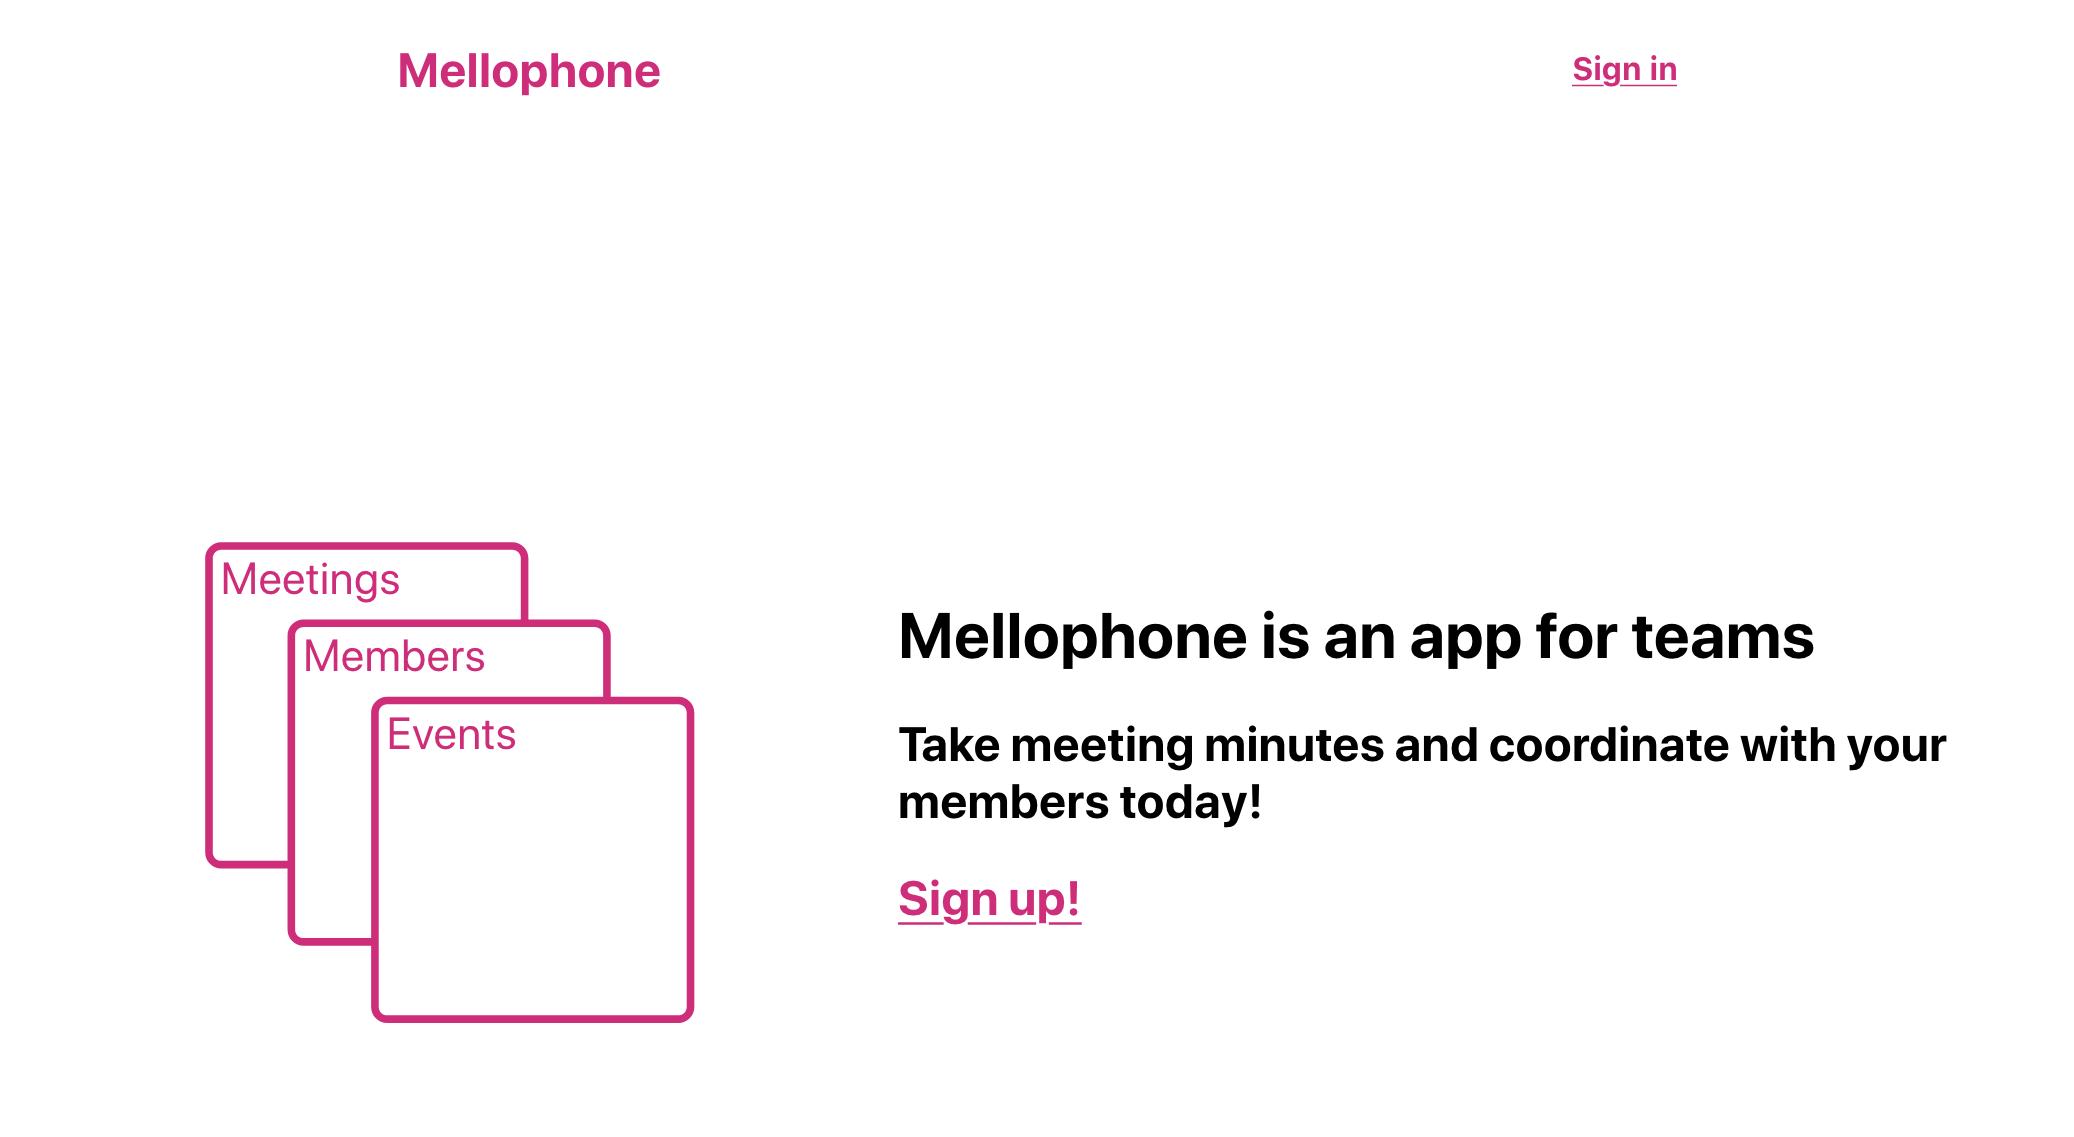 A screenshot of Mellophone's landing page